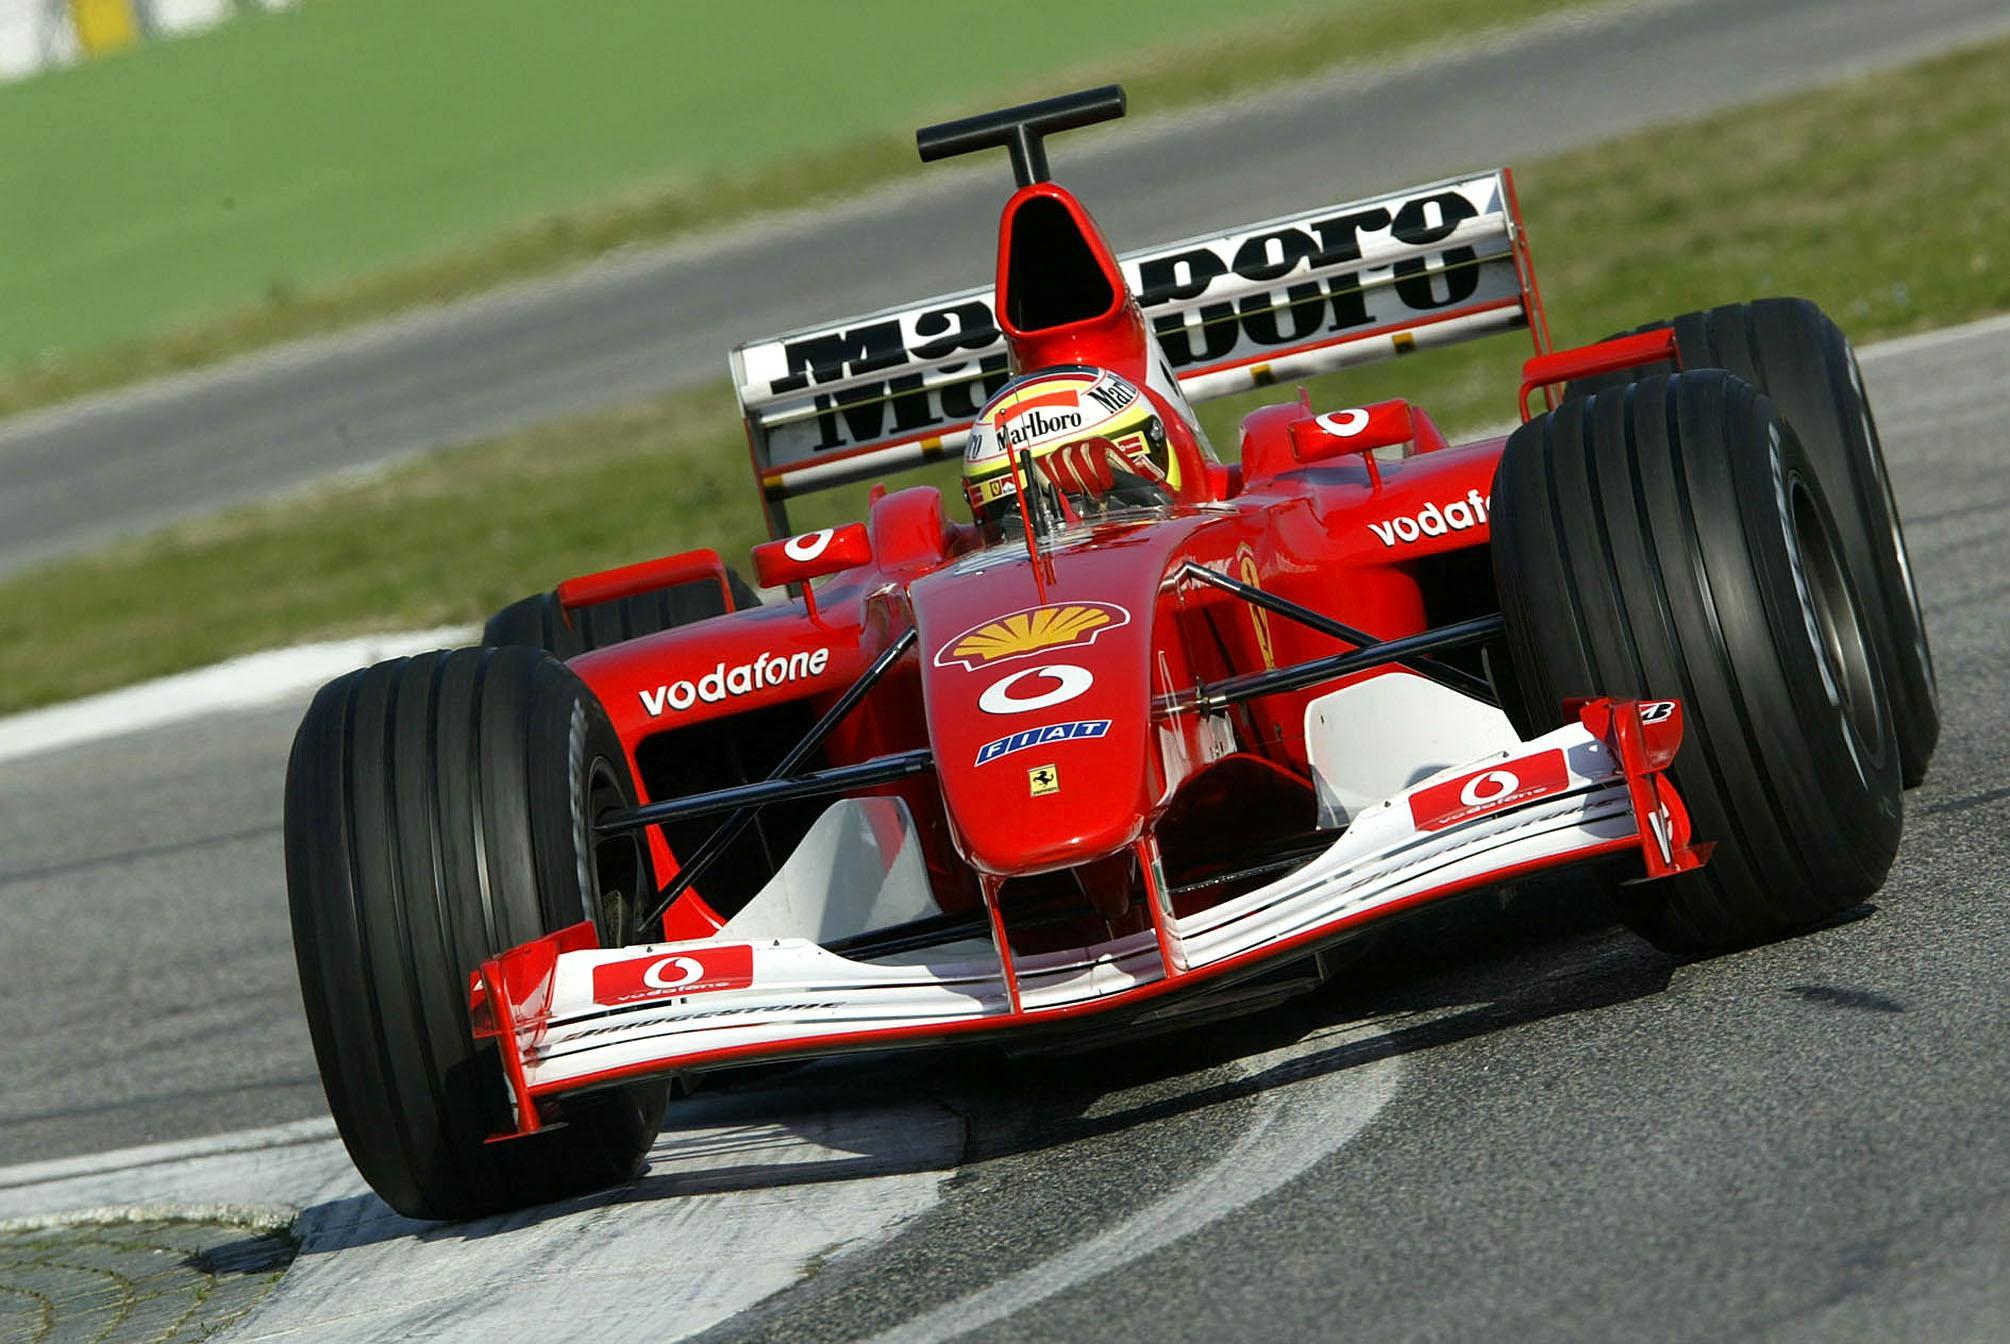 2002 Ferrari F2002 Image Https Www Conceptcarz Com